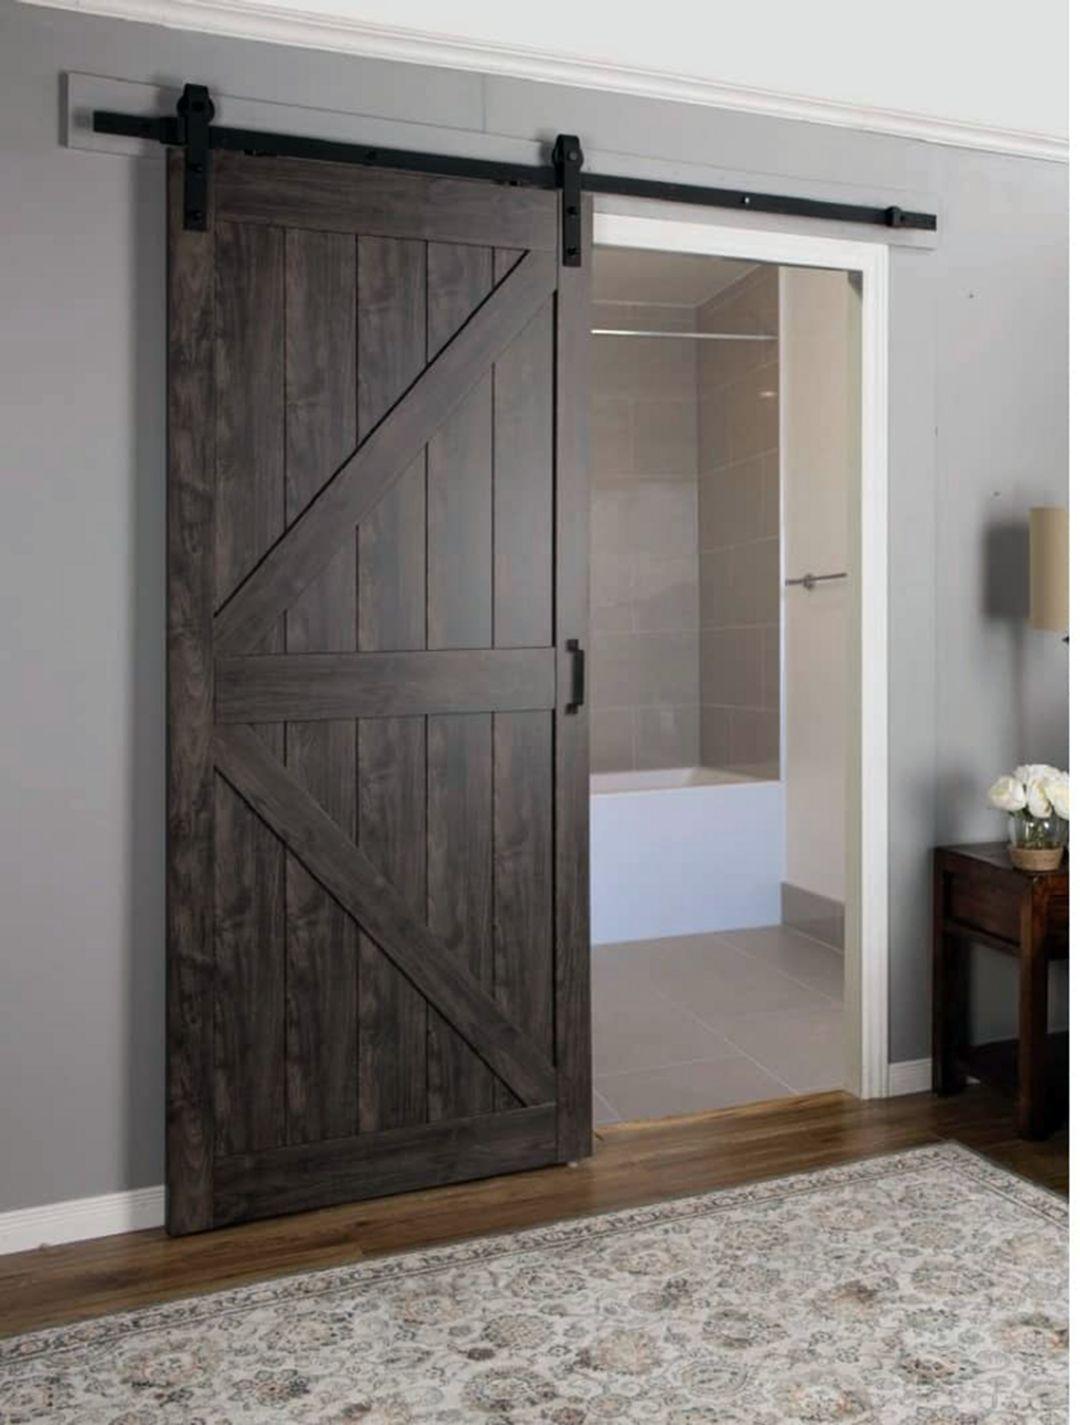 7 Modern Farmhouse Sliding Barn Door Ideas In 2020 Interior Barn Doors Doors Interior Wood Doors Interior